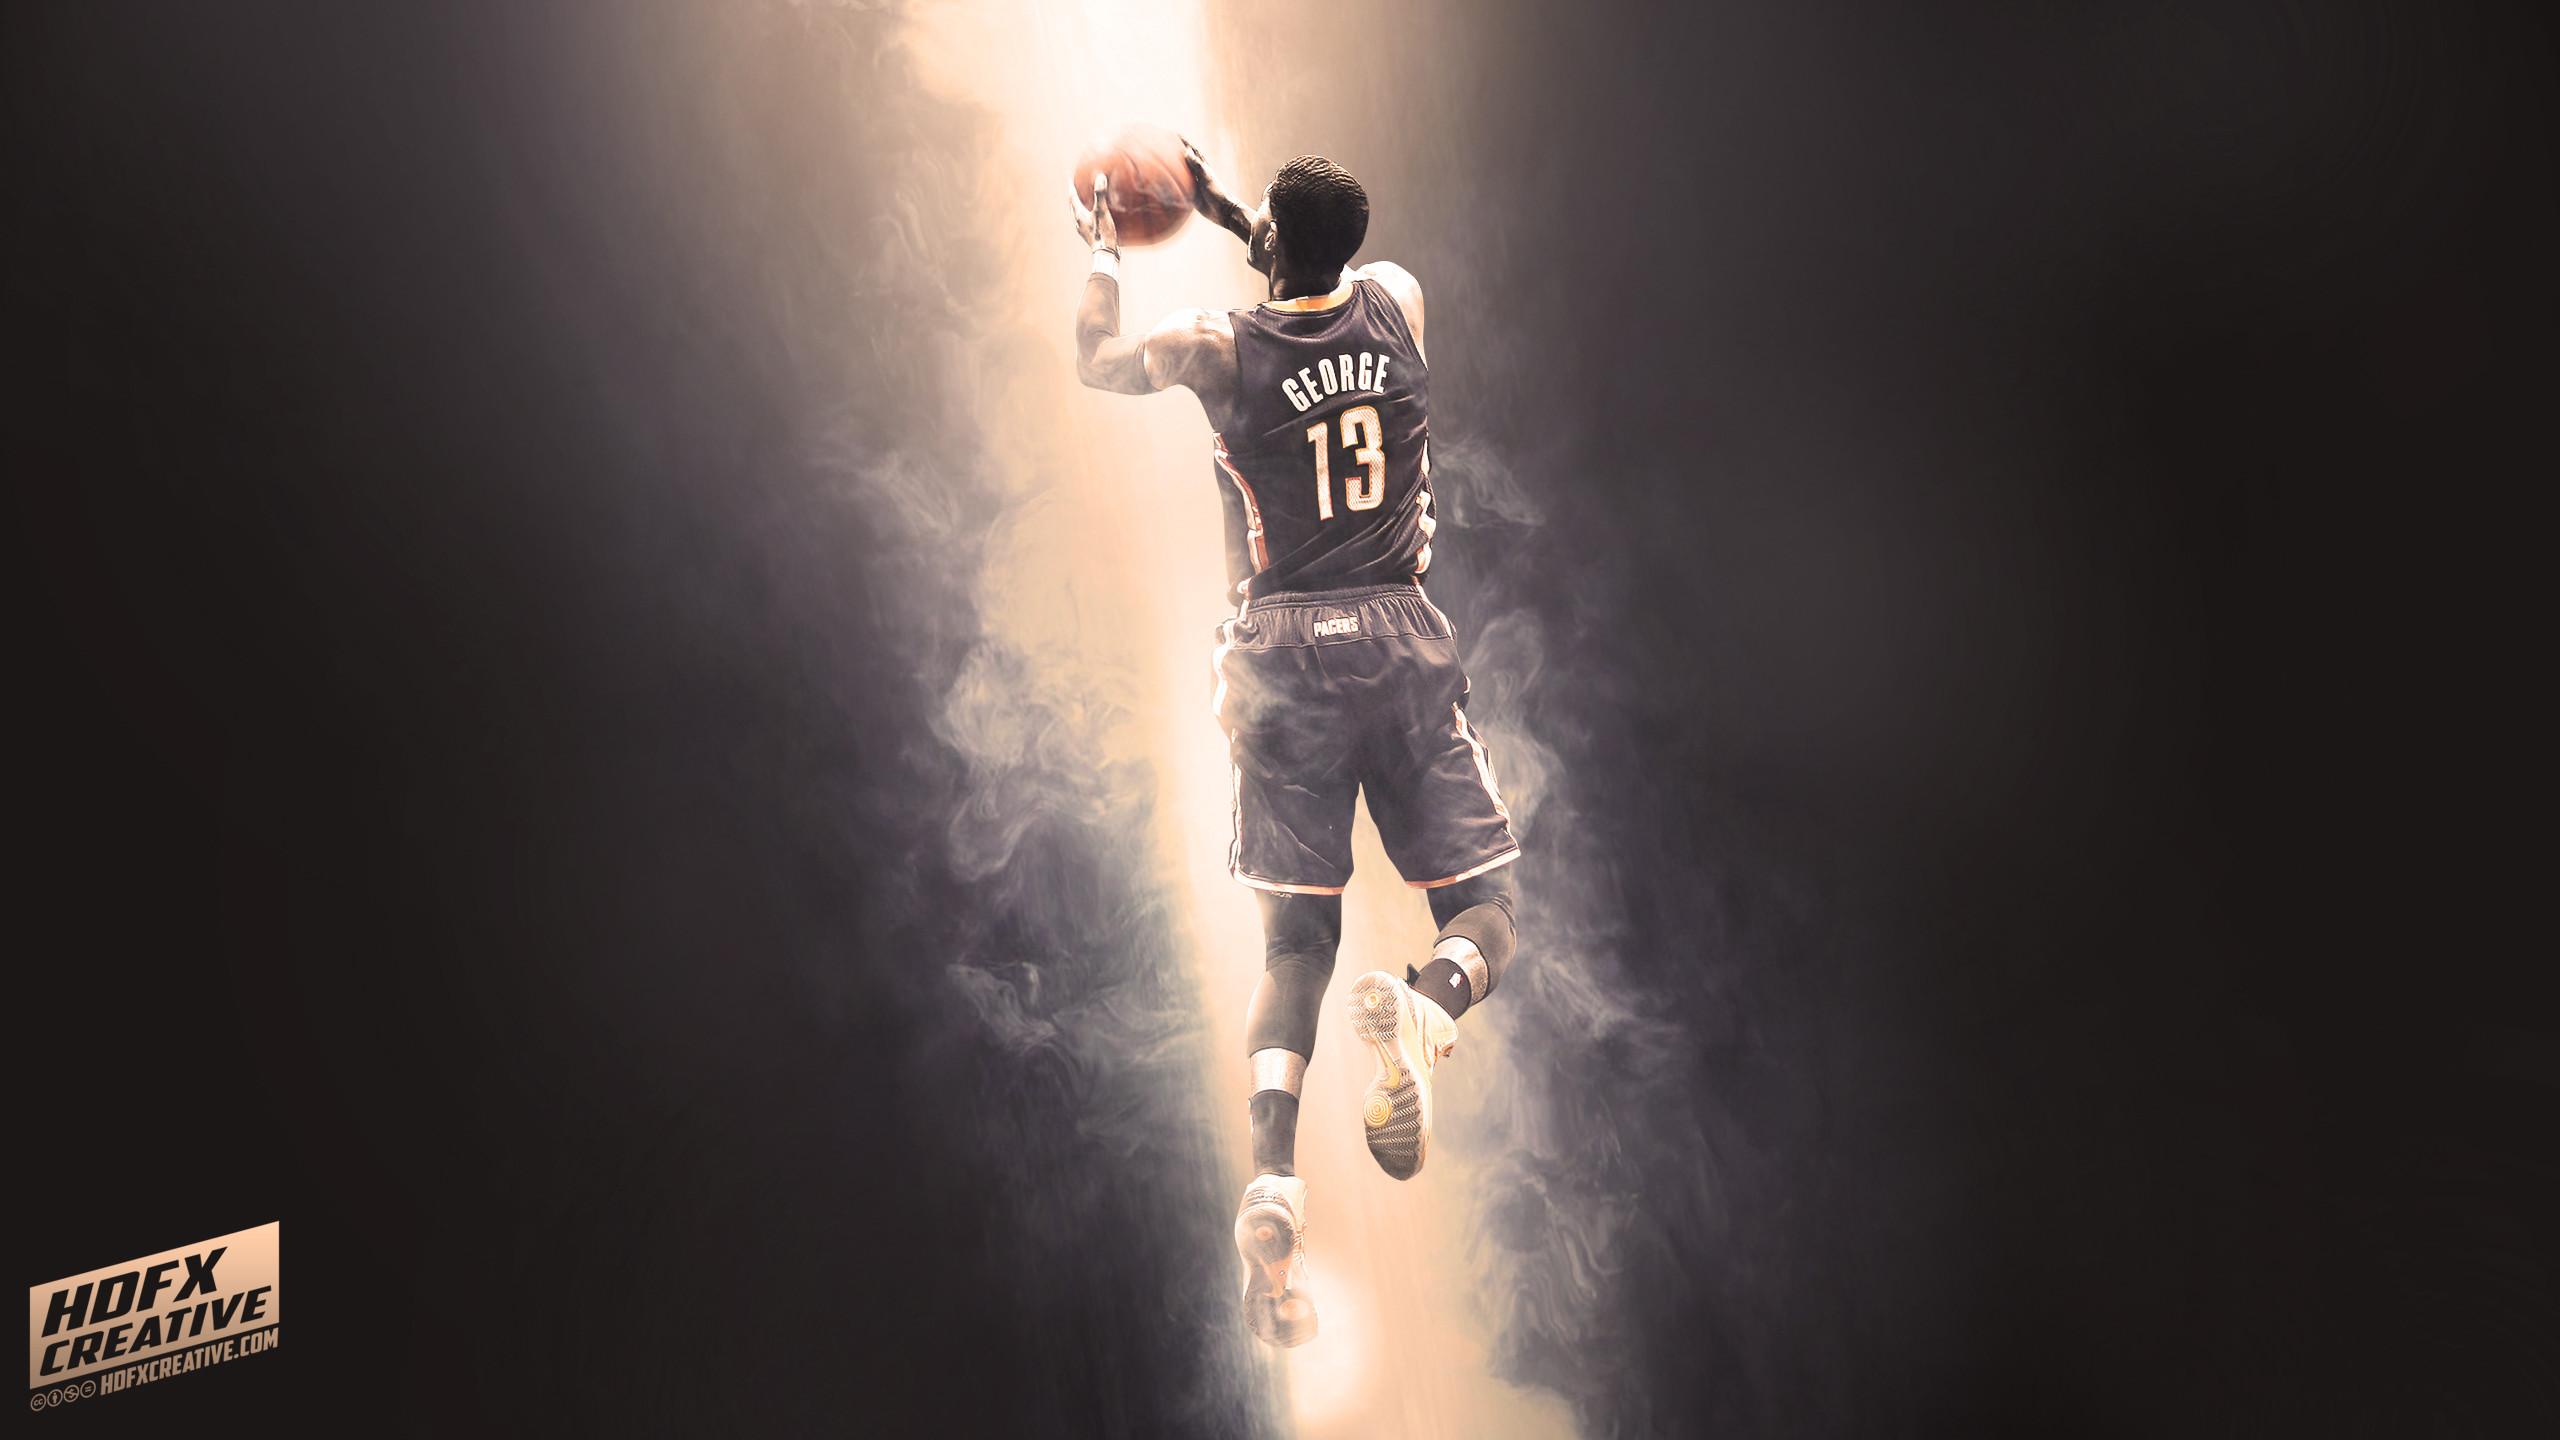 Paul George NBA Wallpaper by skythlee on DeviantArt